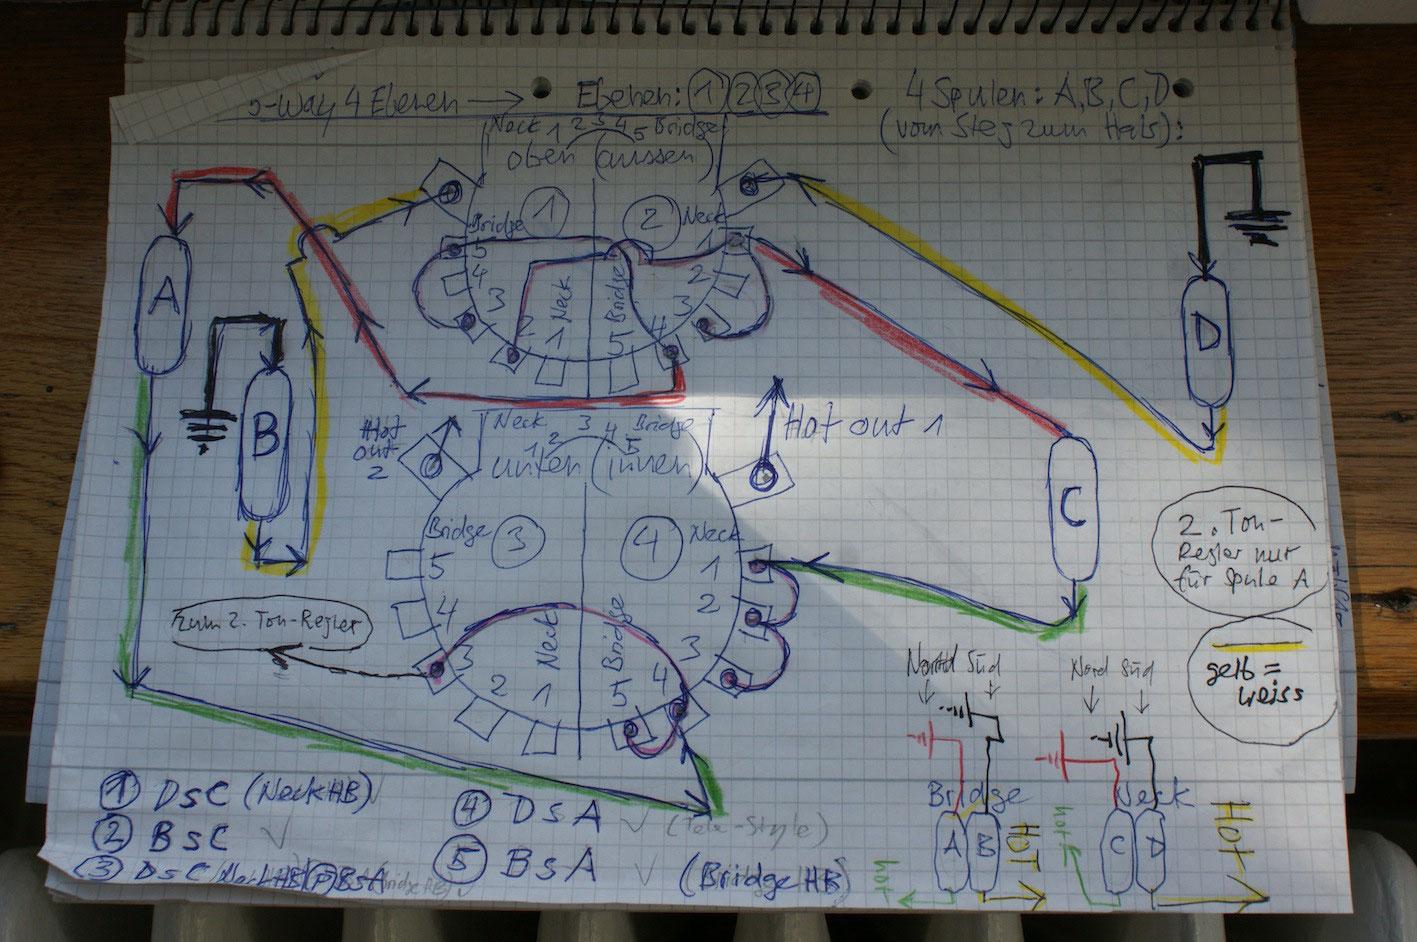 gretsch guitar wiring diagrams b850 gretsch astro jet wiring diagram wiring resources  b850 gretsch astro jet wiring diagram